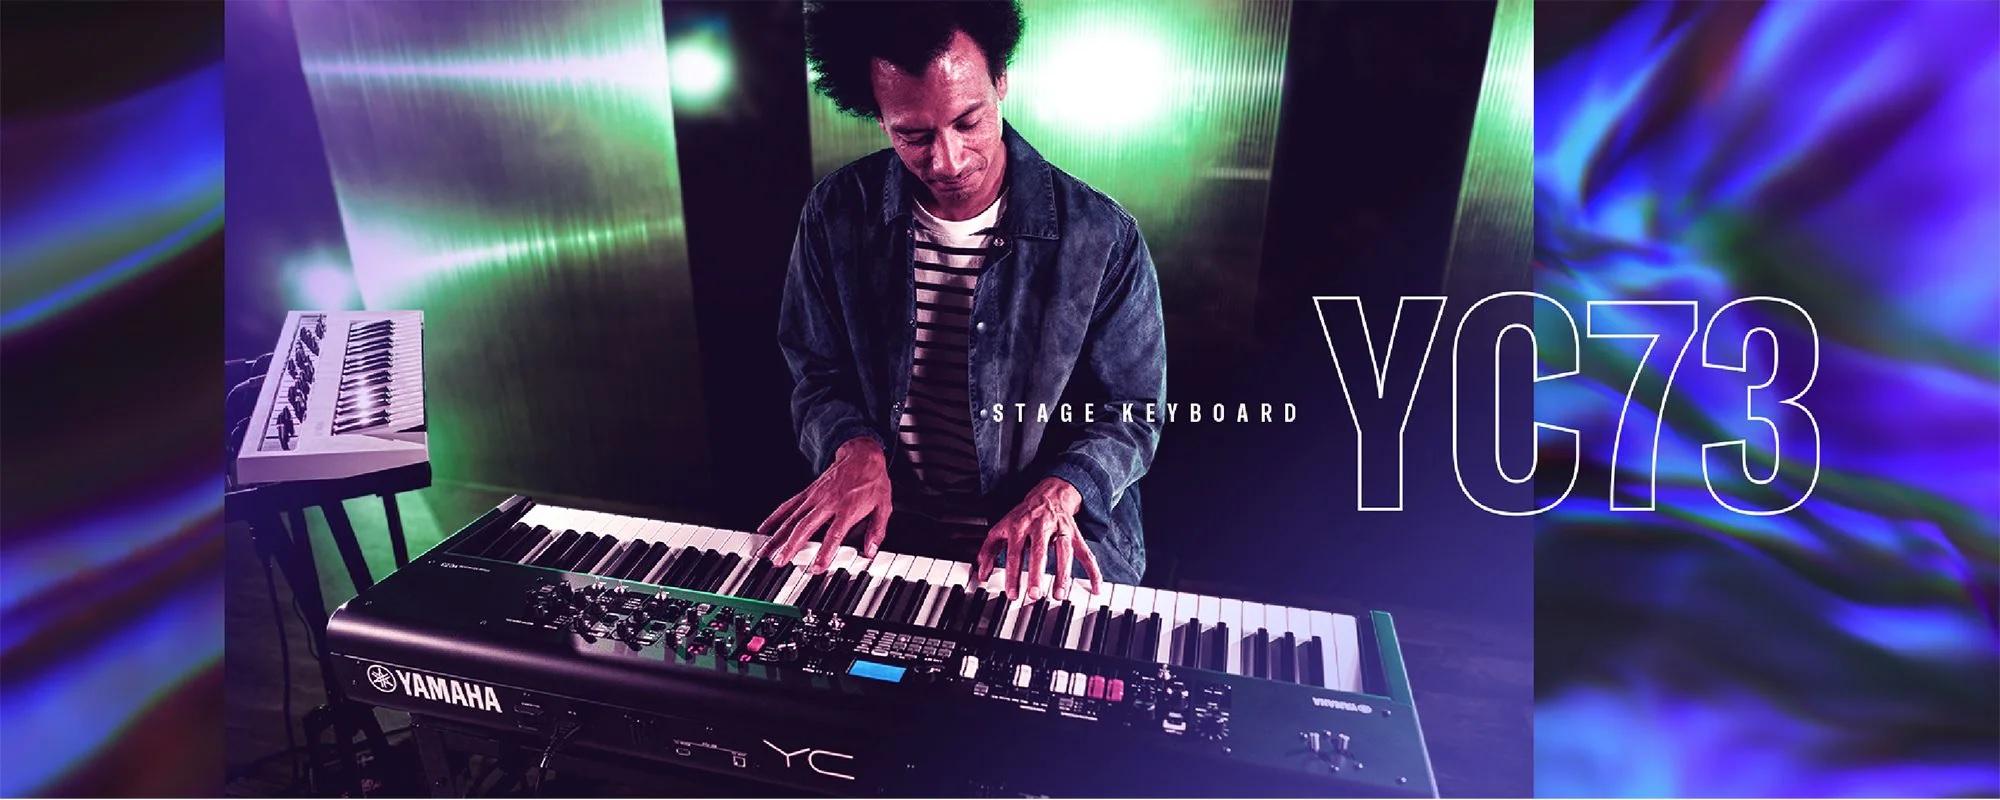 yamaha yc73 header image